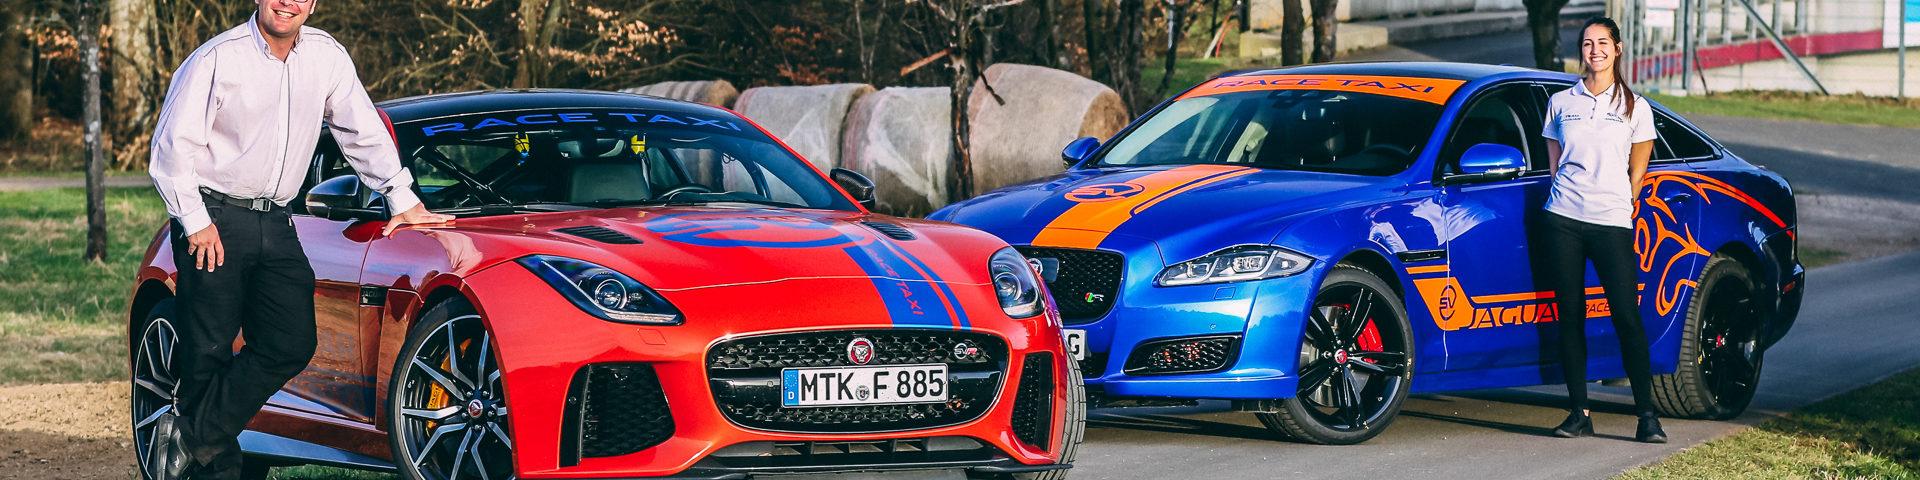 nurburgring ringtaxi jaguar